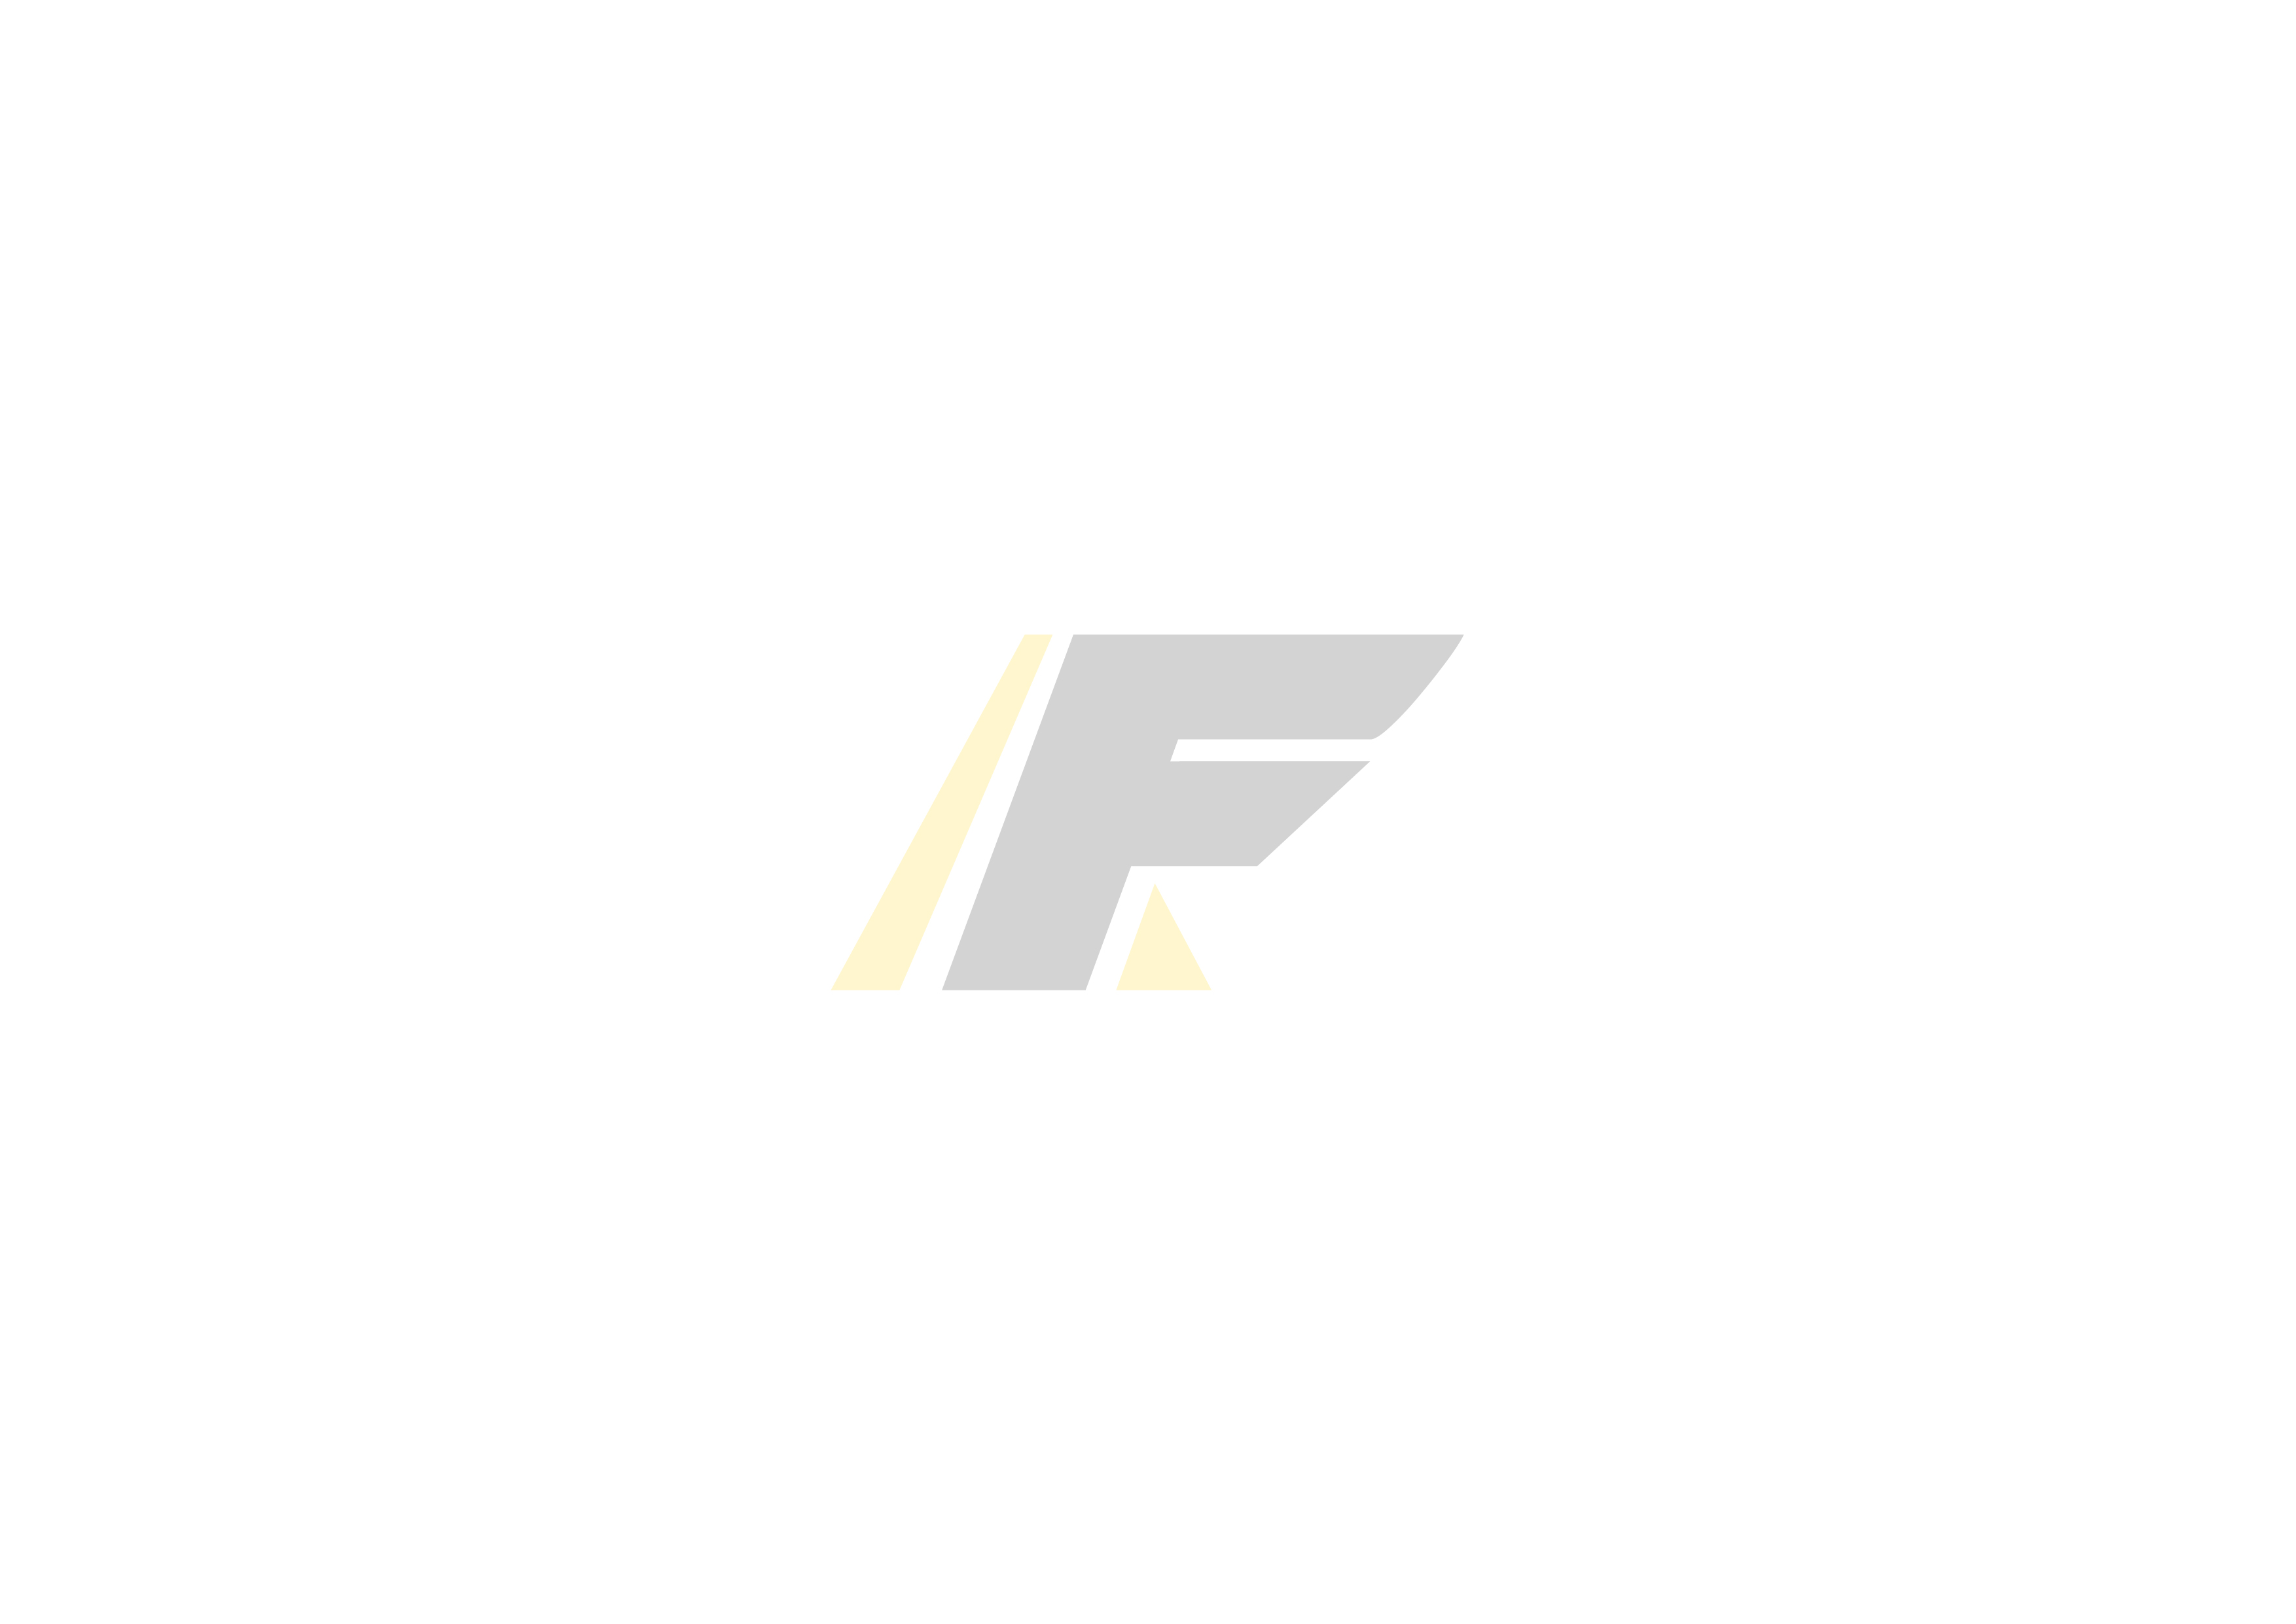 Dunlop - KT341 Quad Competition Radial